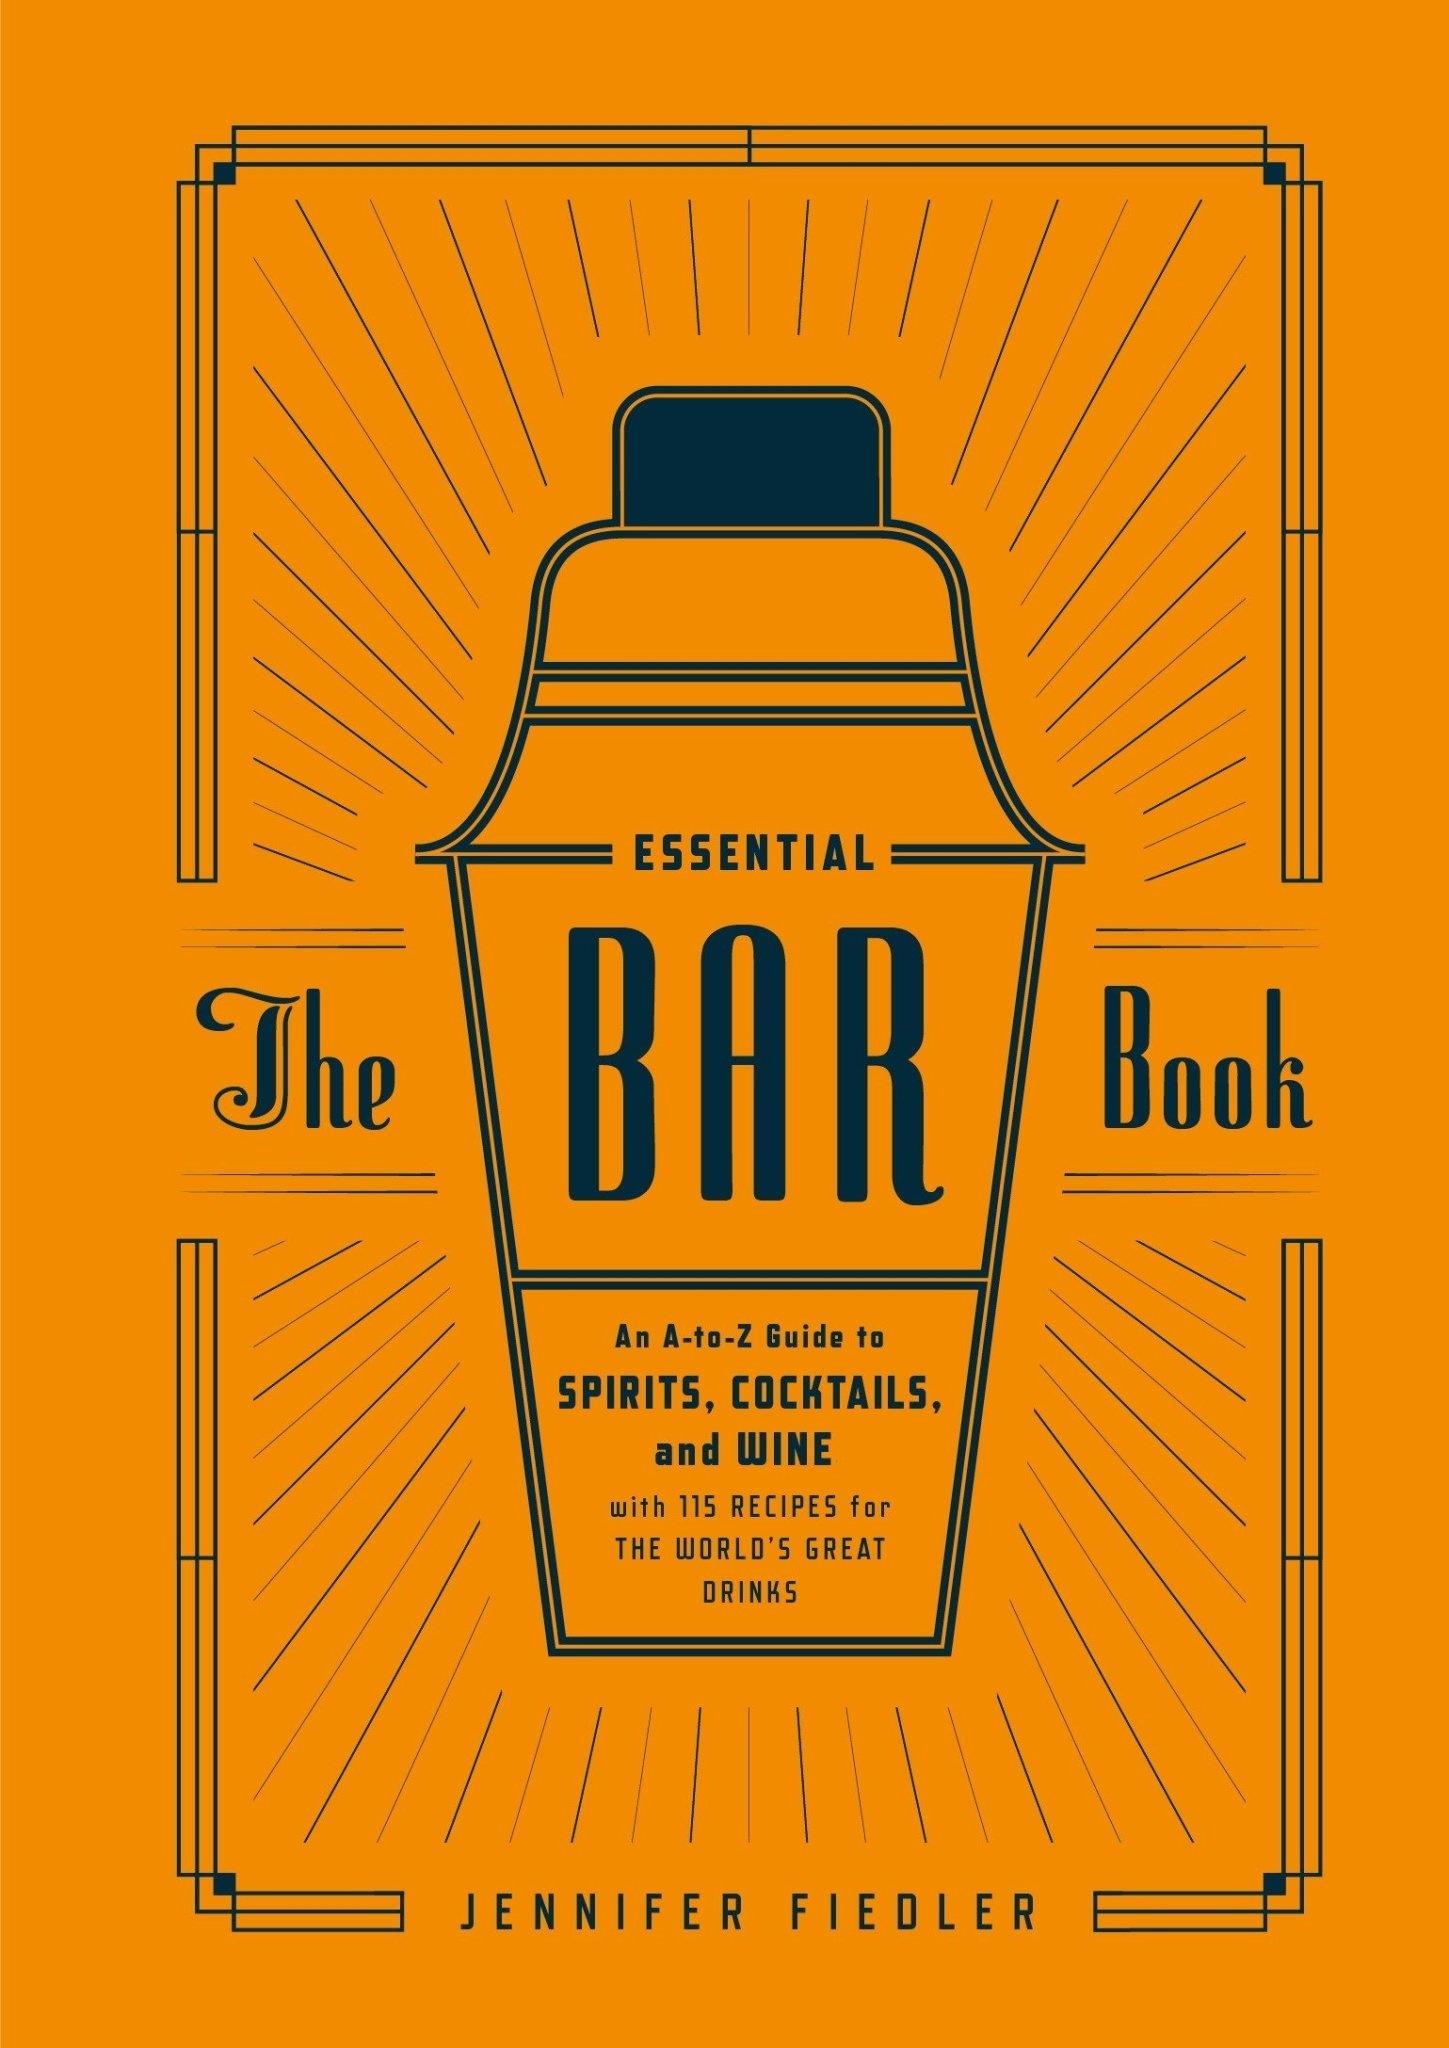 Book - The Essential BAR Book by Jennifer Fiedler